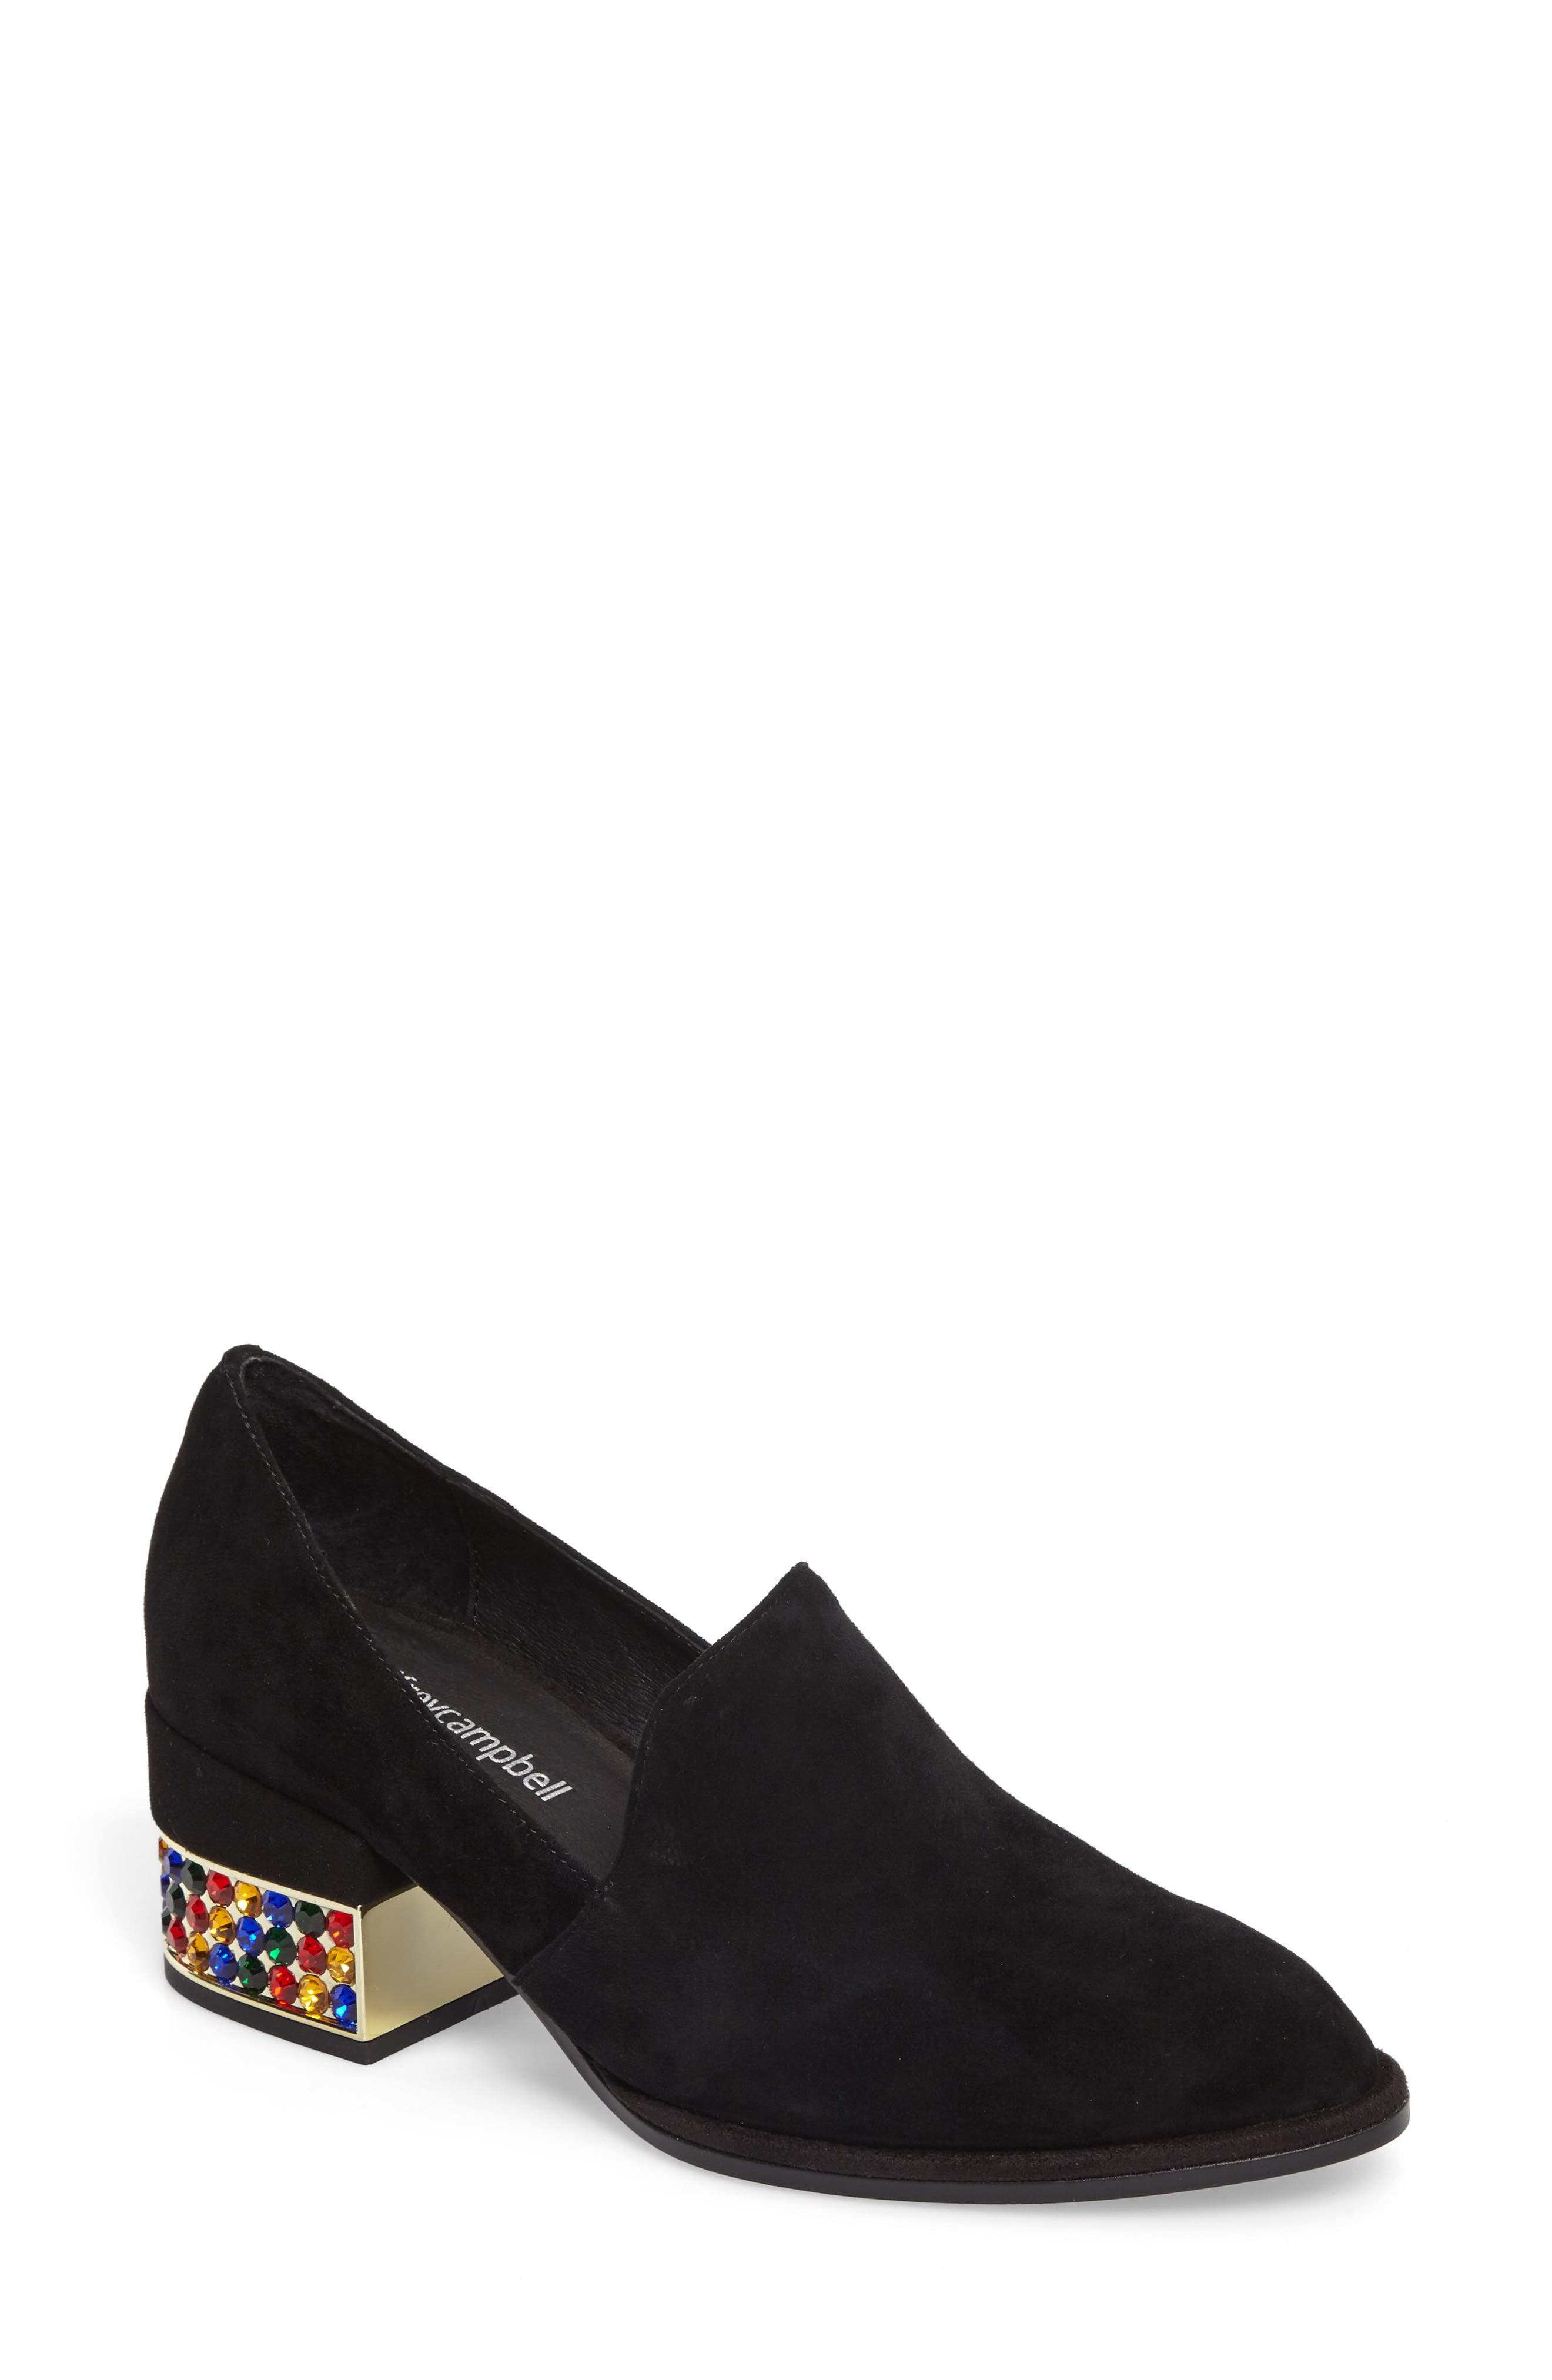 Serlin Jeweled Heel Loafer,                         Main,                         color, 004